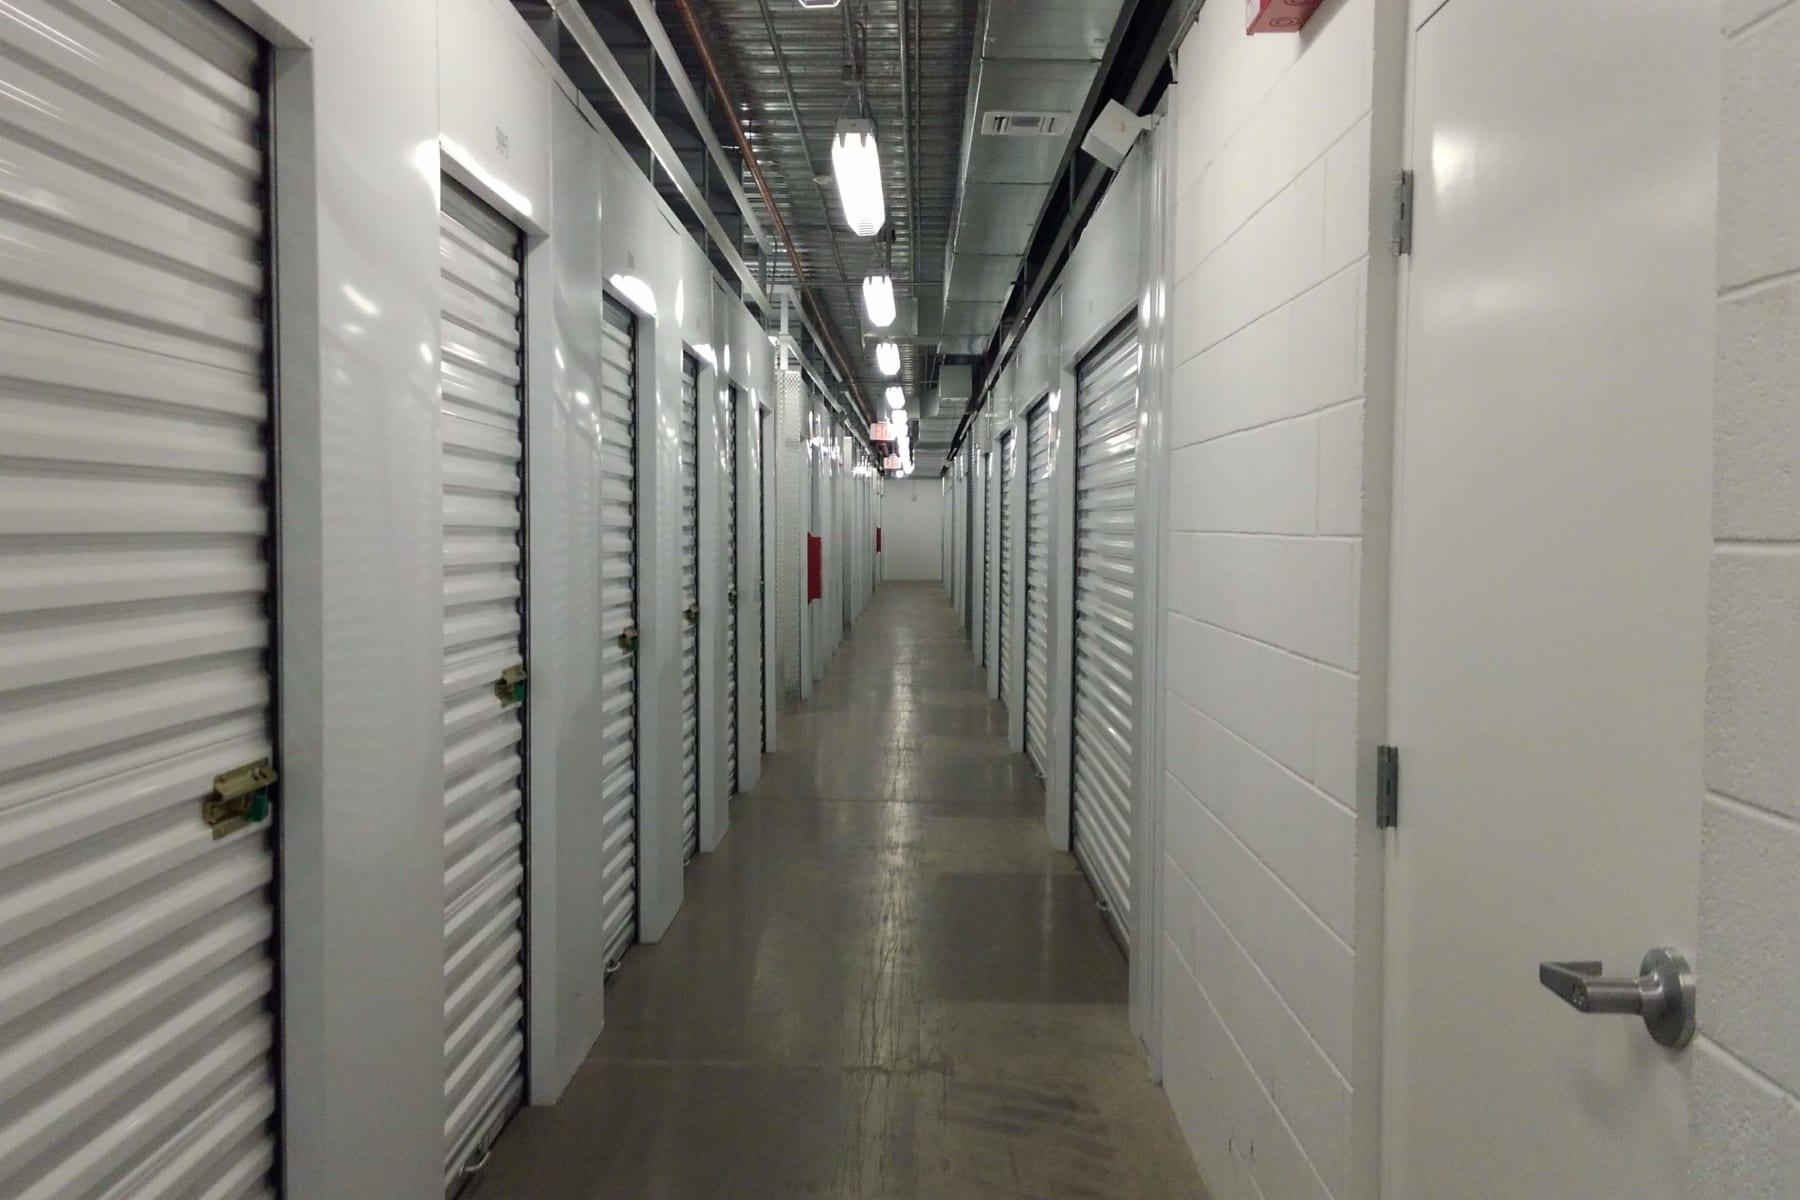 Hallway of units at StorQuest Self Storage in Chandler, Arizona